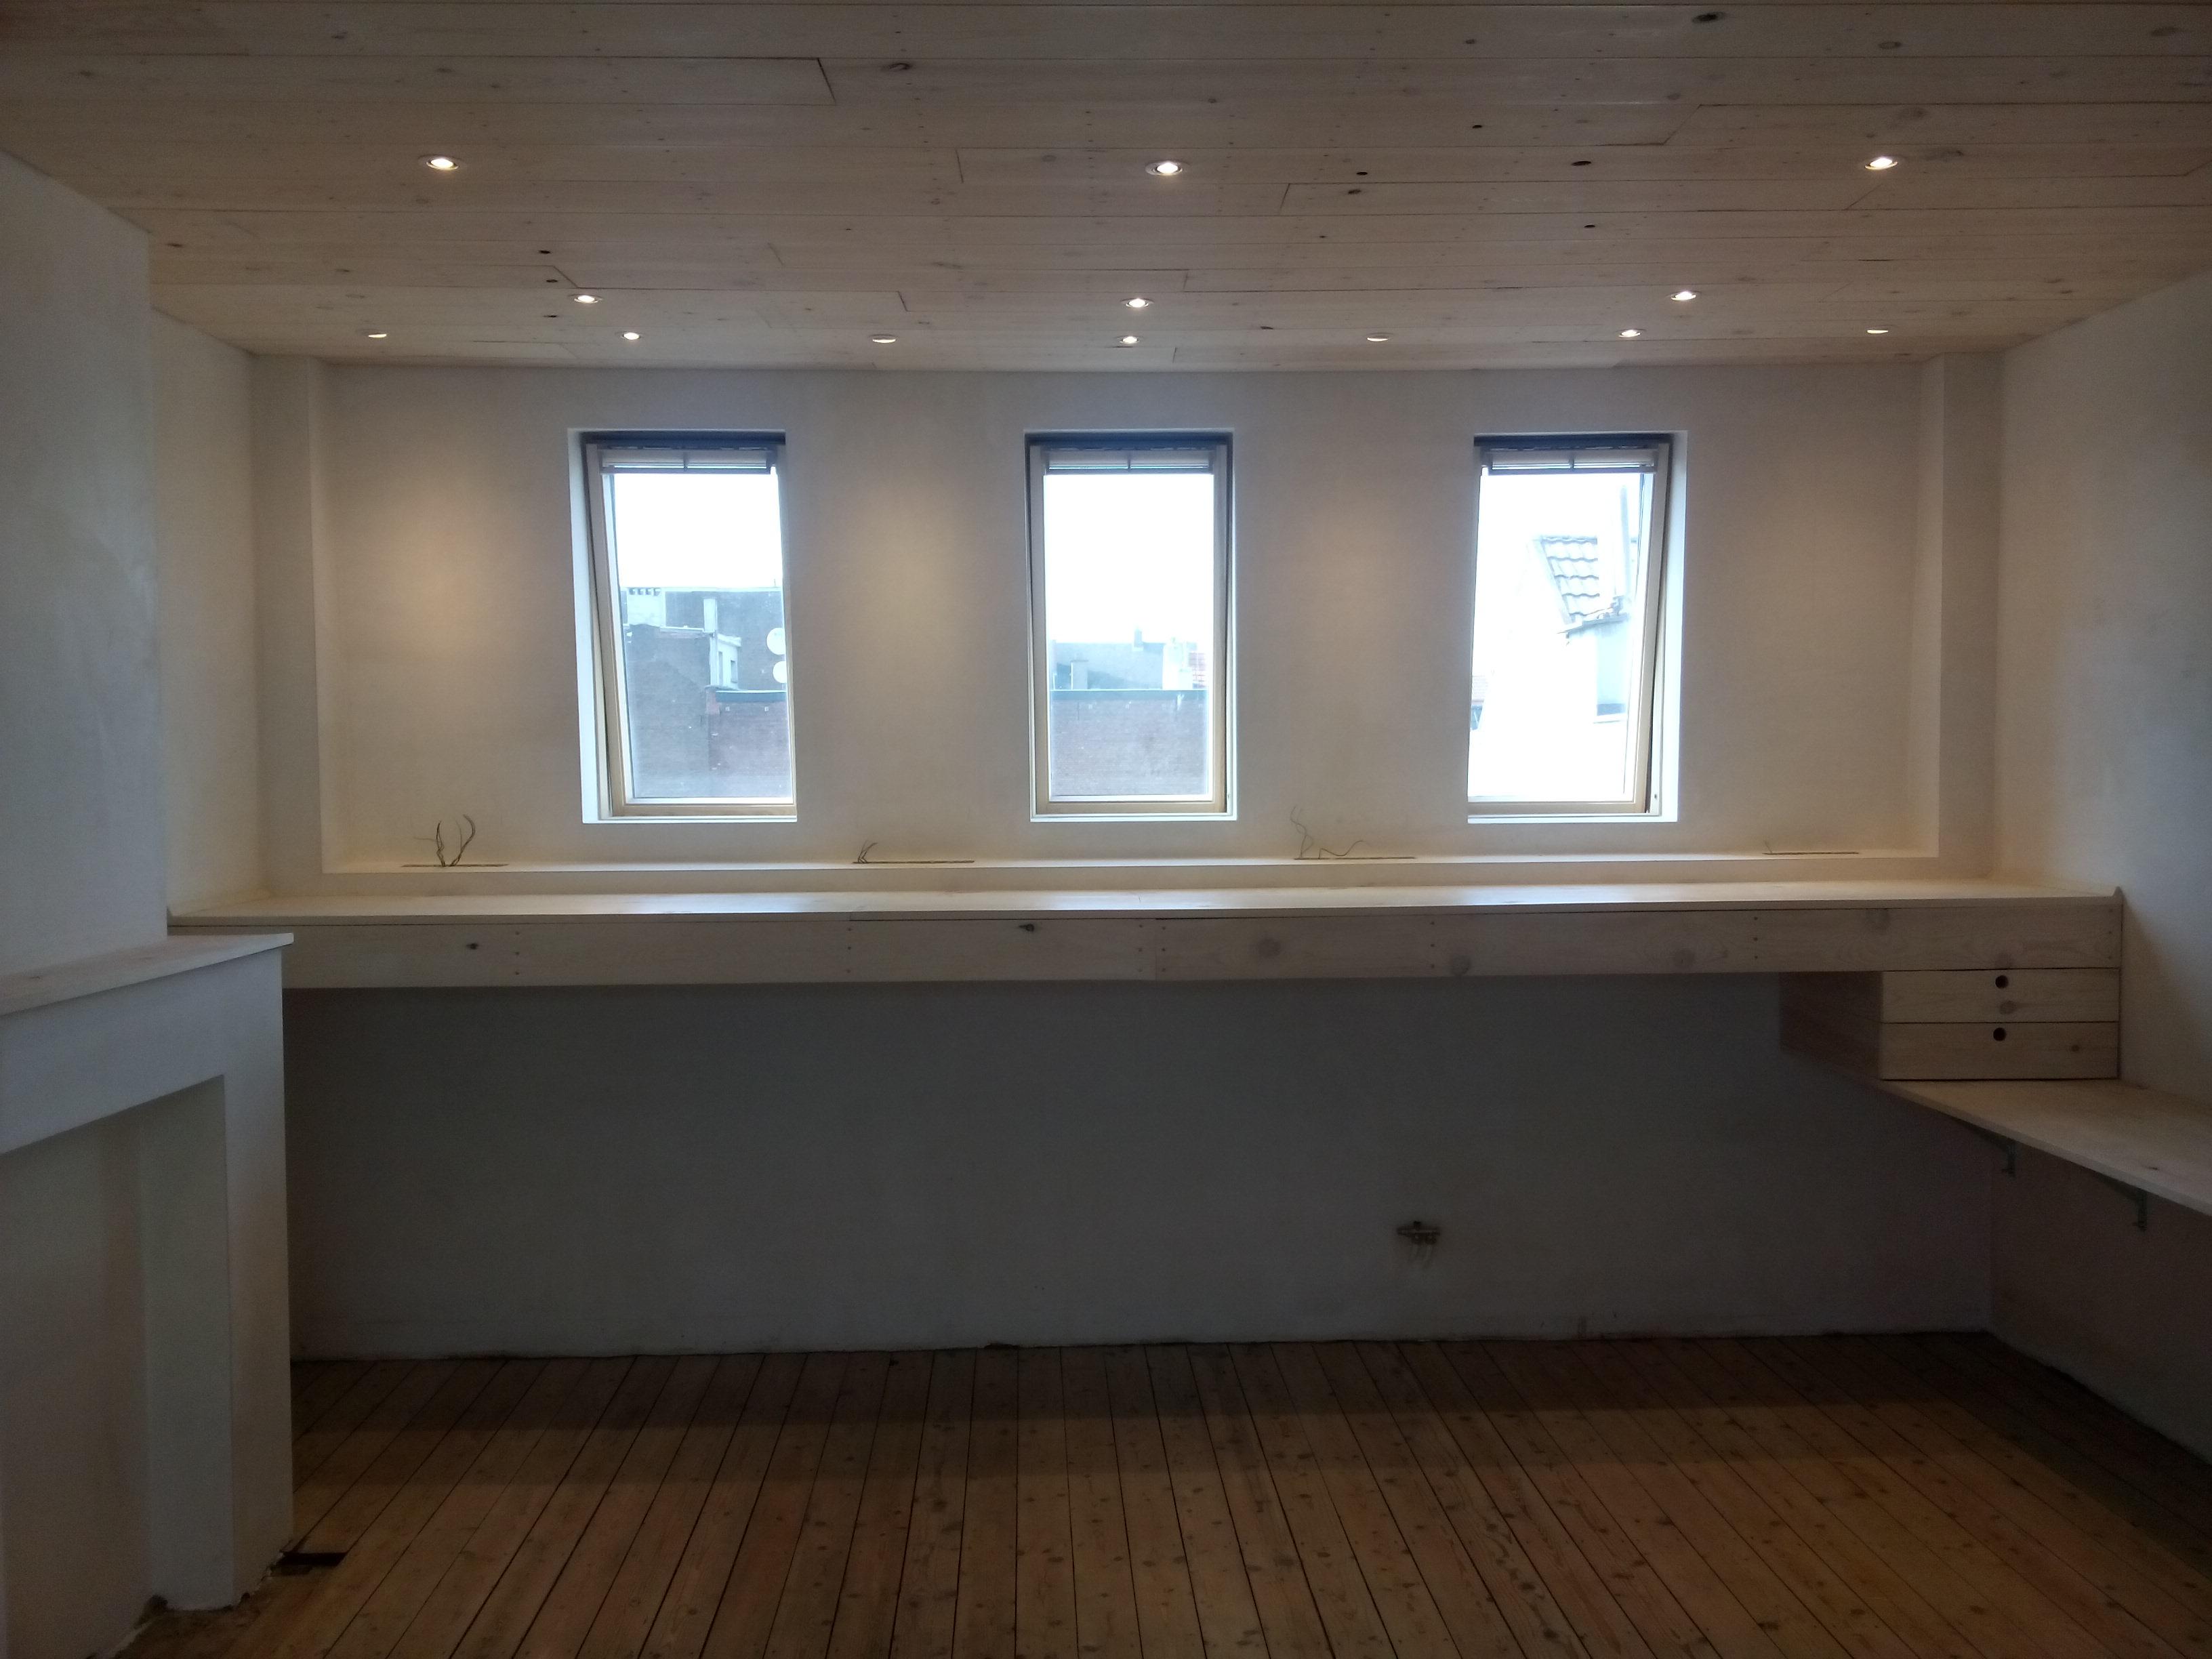 Verbouwingen: update bovenste verdieping